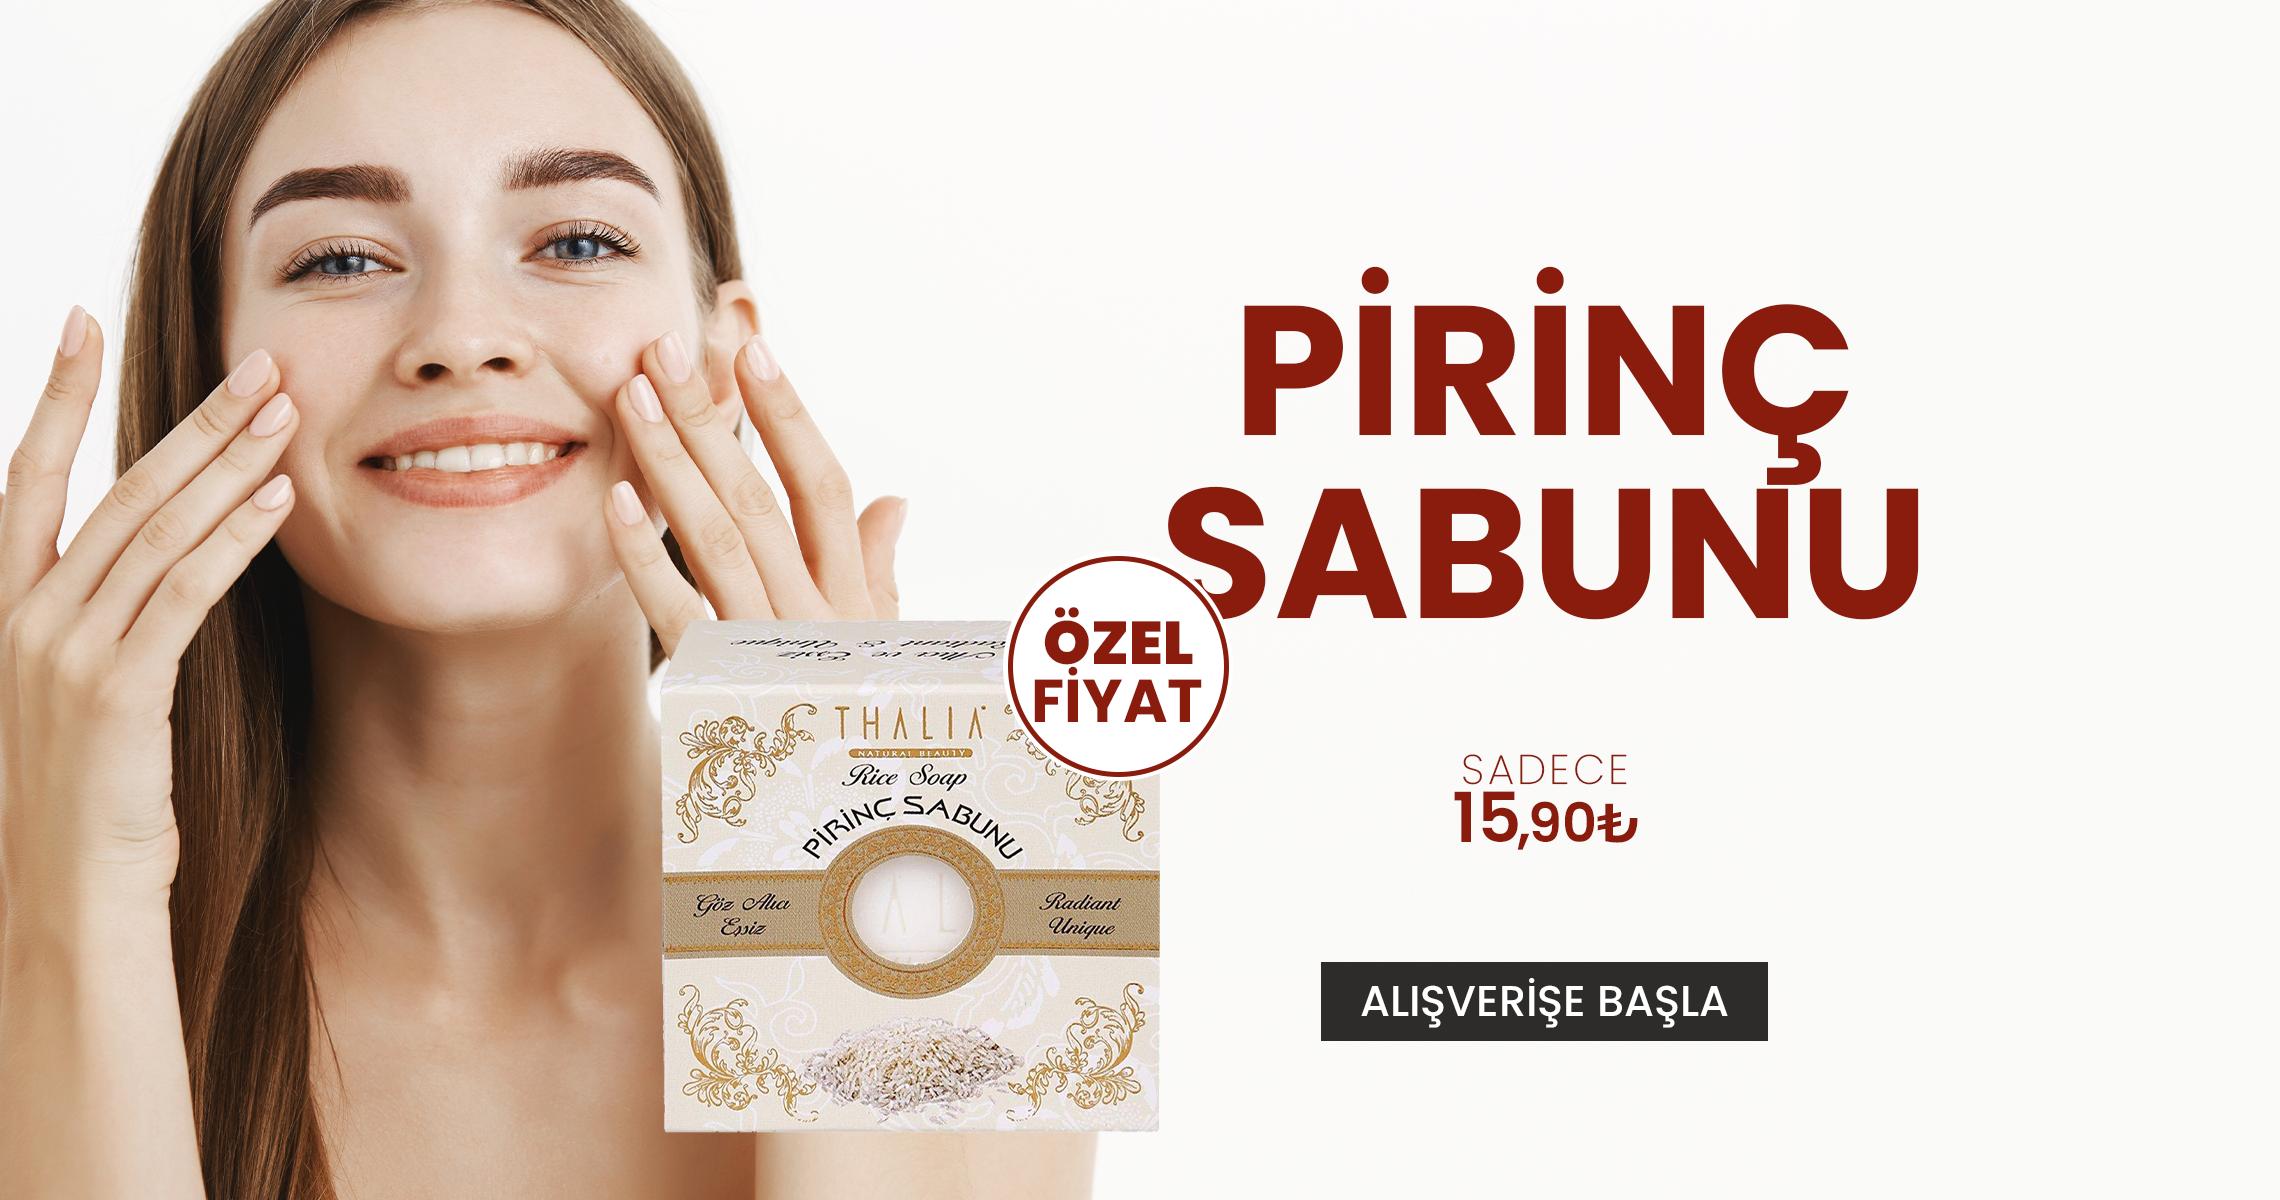 pirinc sabunu